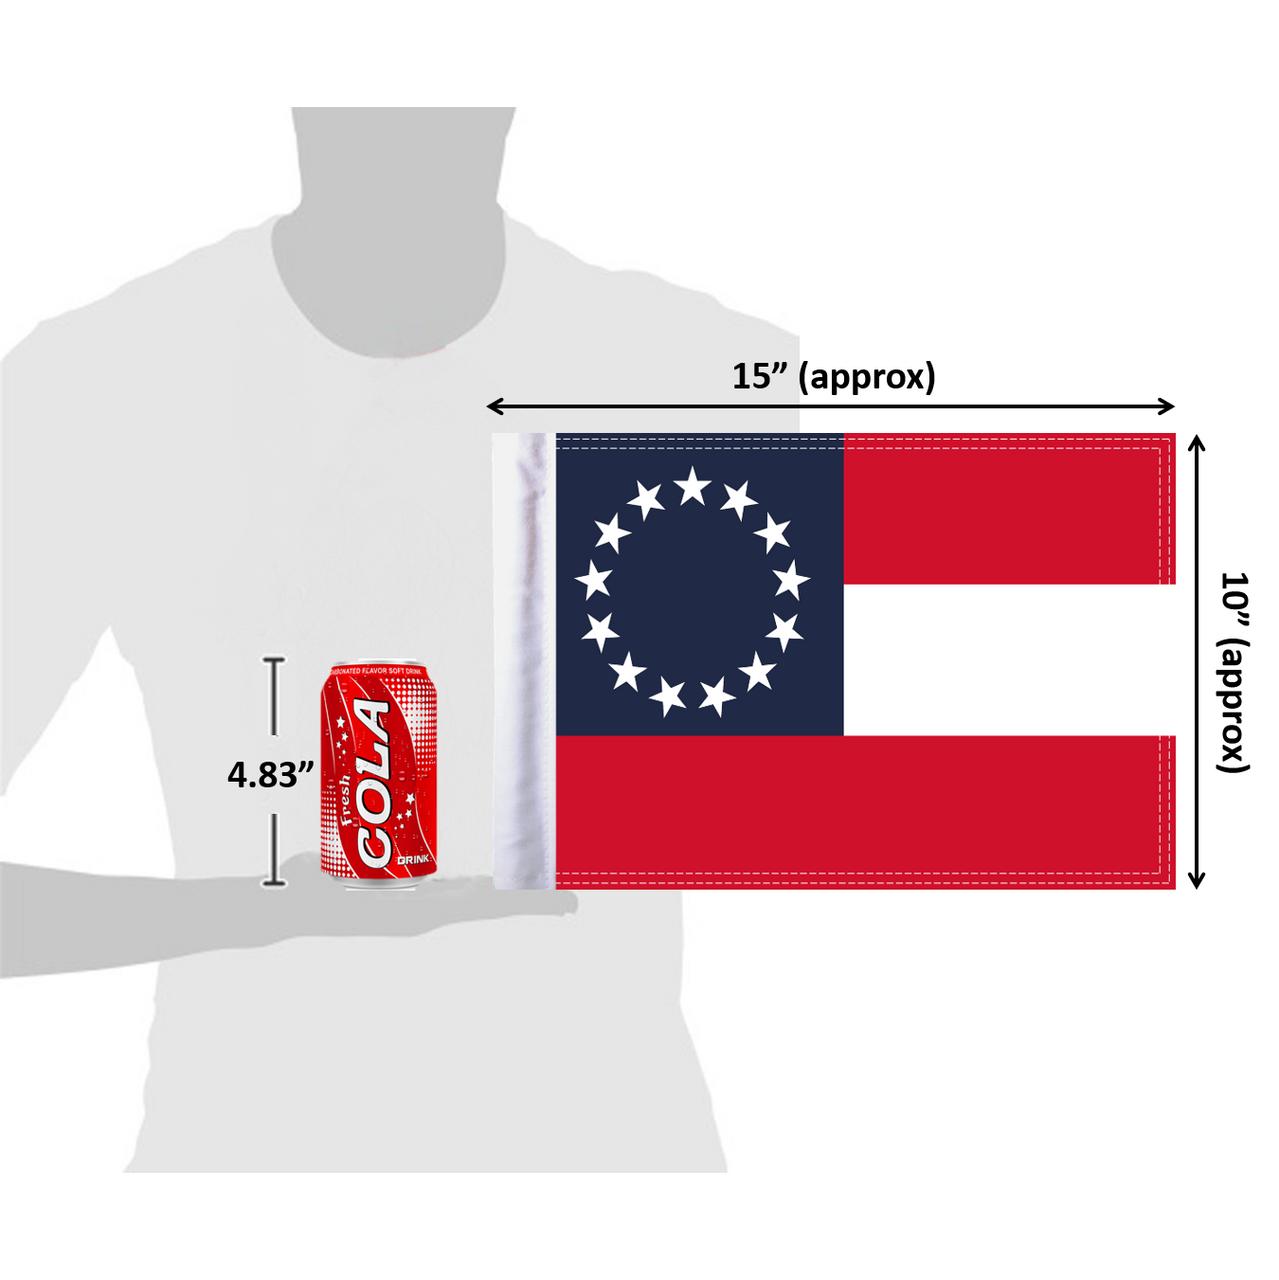 "10""x15"" Confederate Stars and Bars flag (size comparison view)"